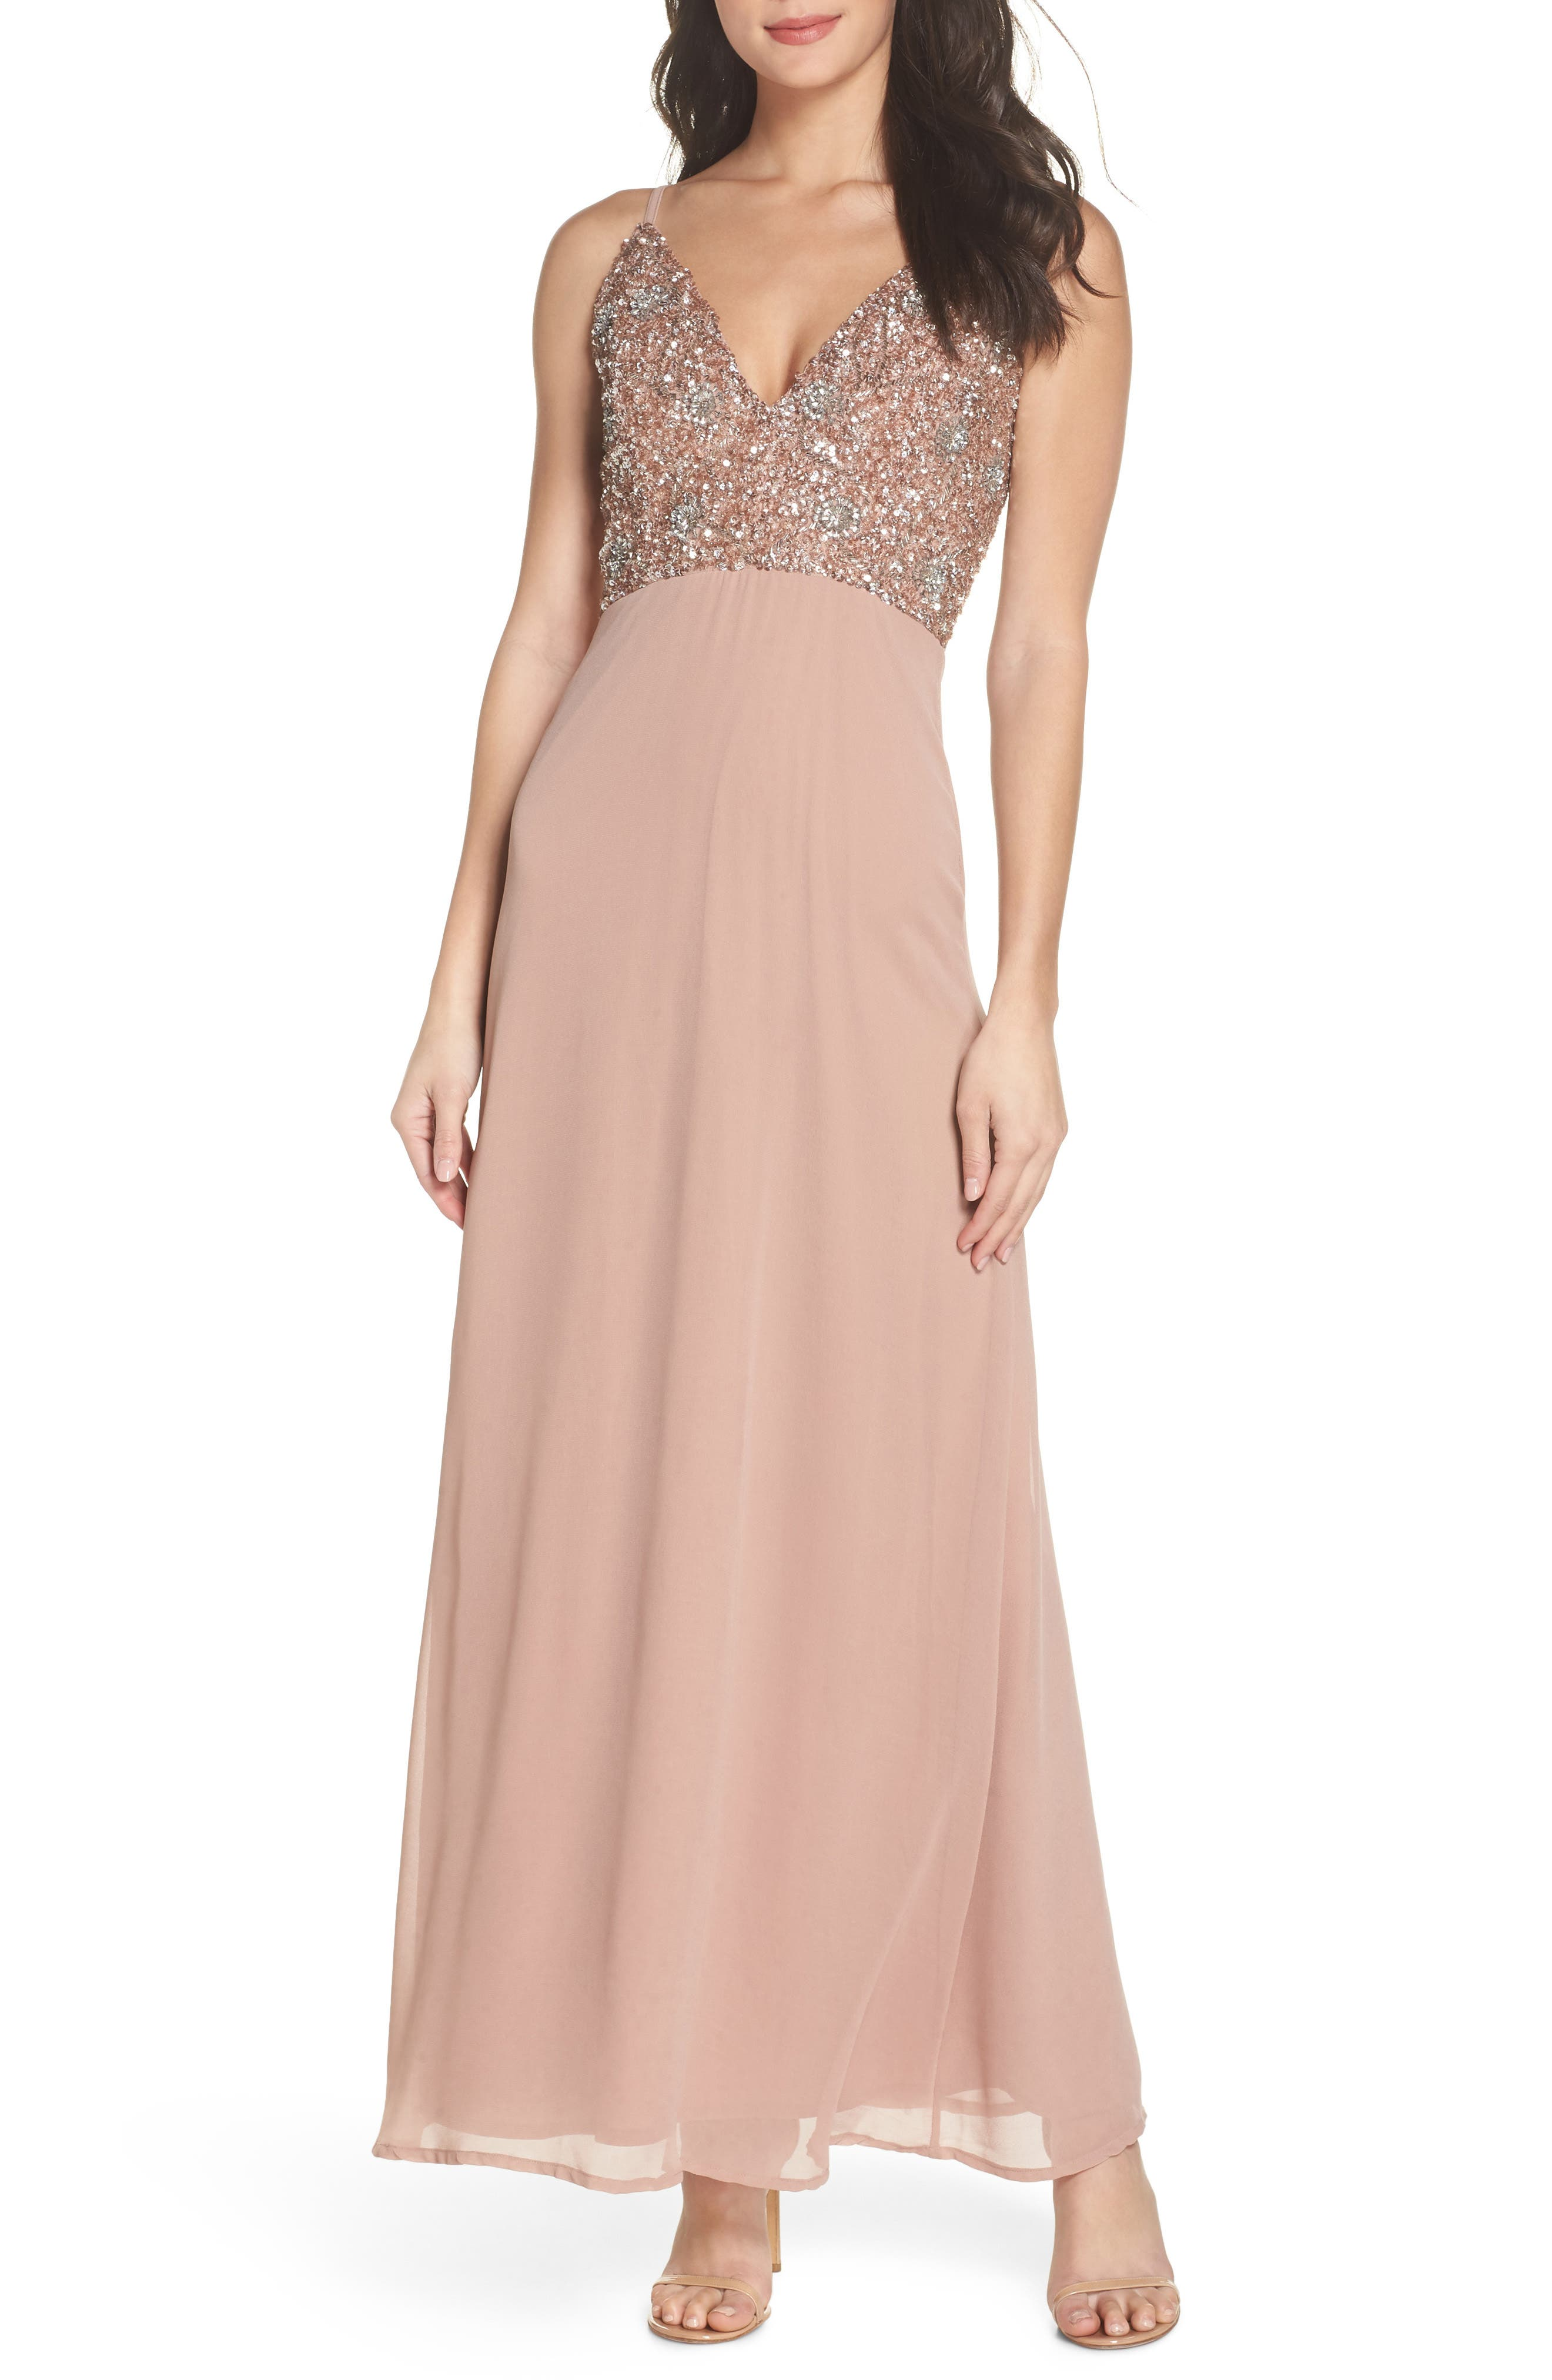 Lace & Beads Embellished Chiffon Gown